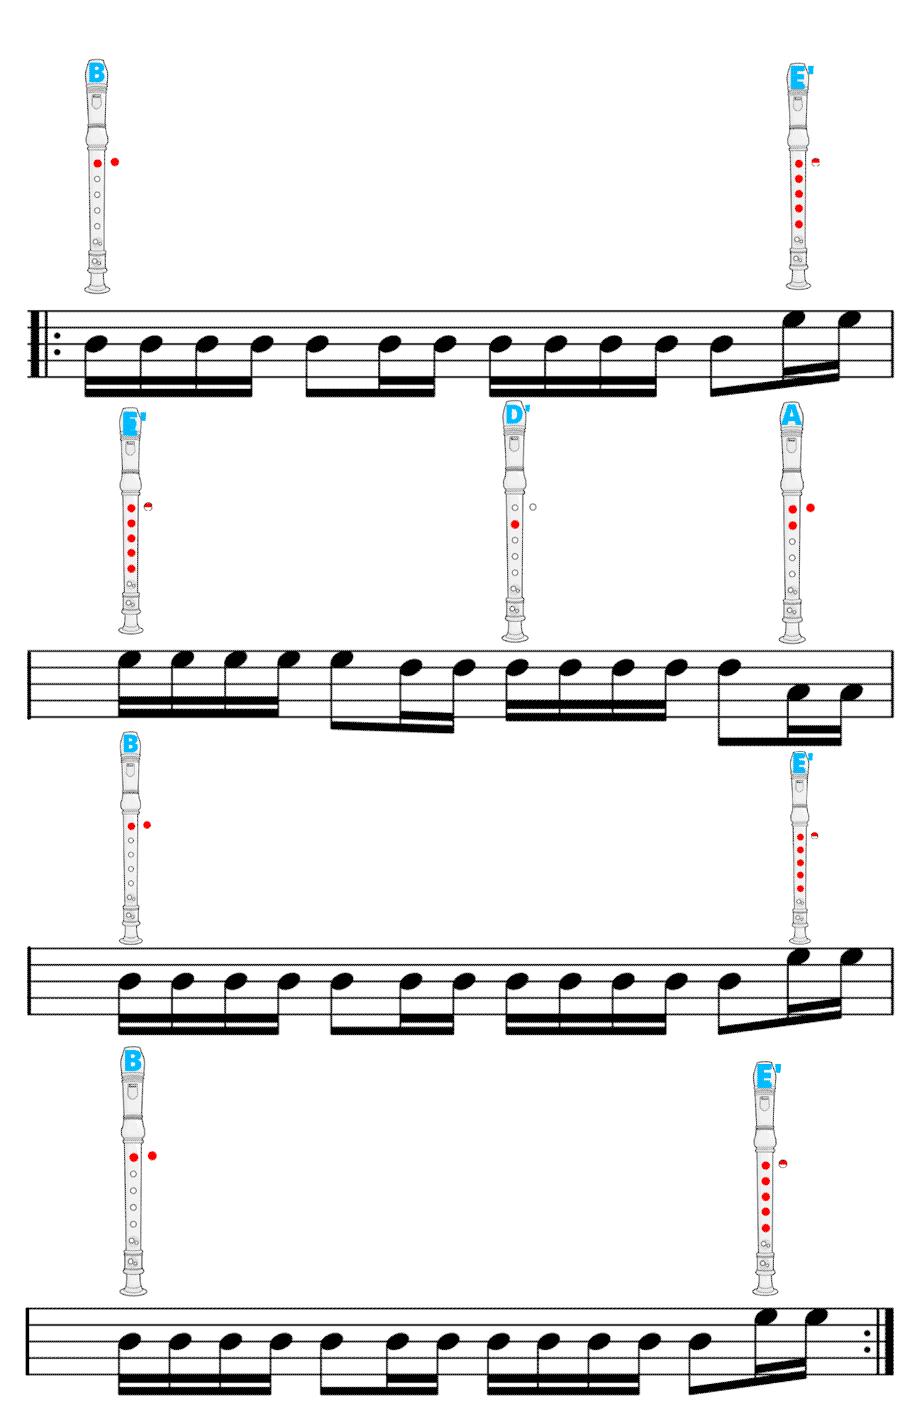 how to play darude sandstorm part 2